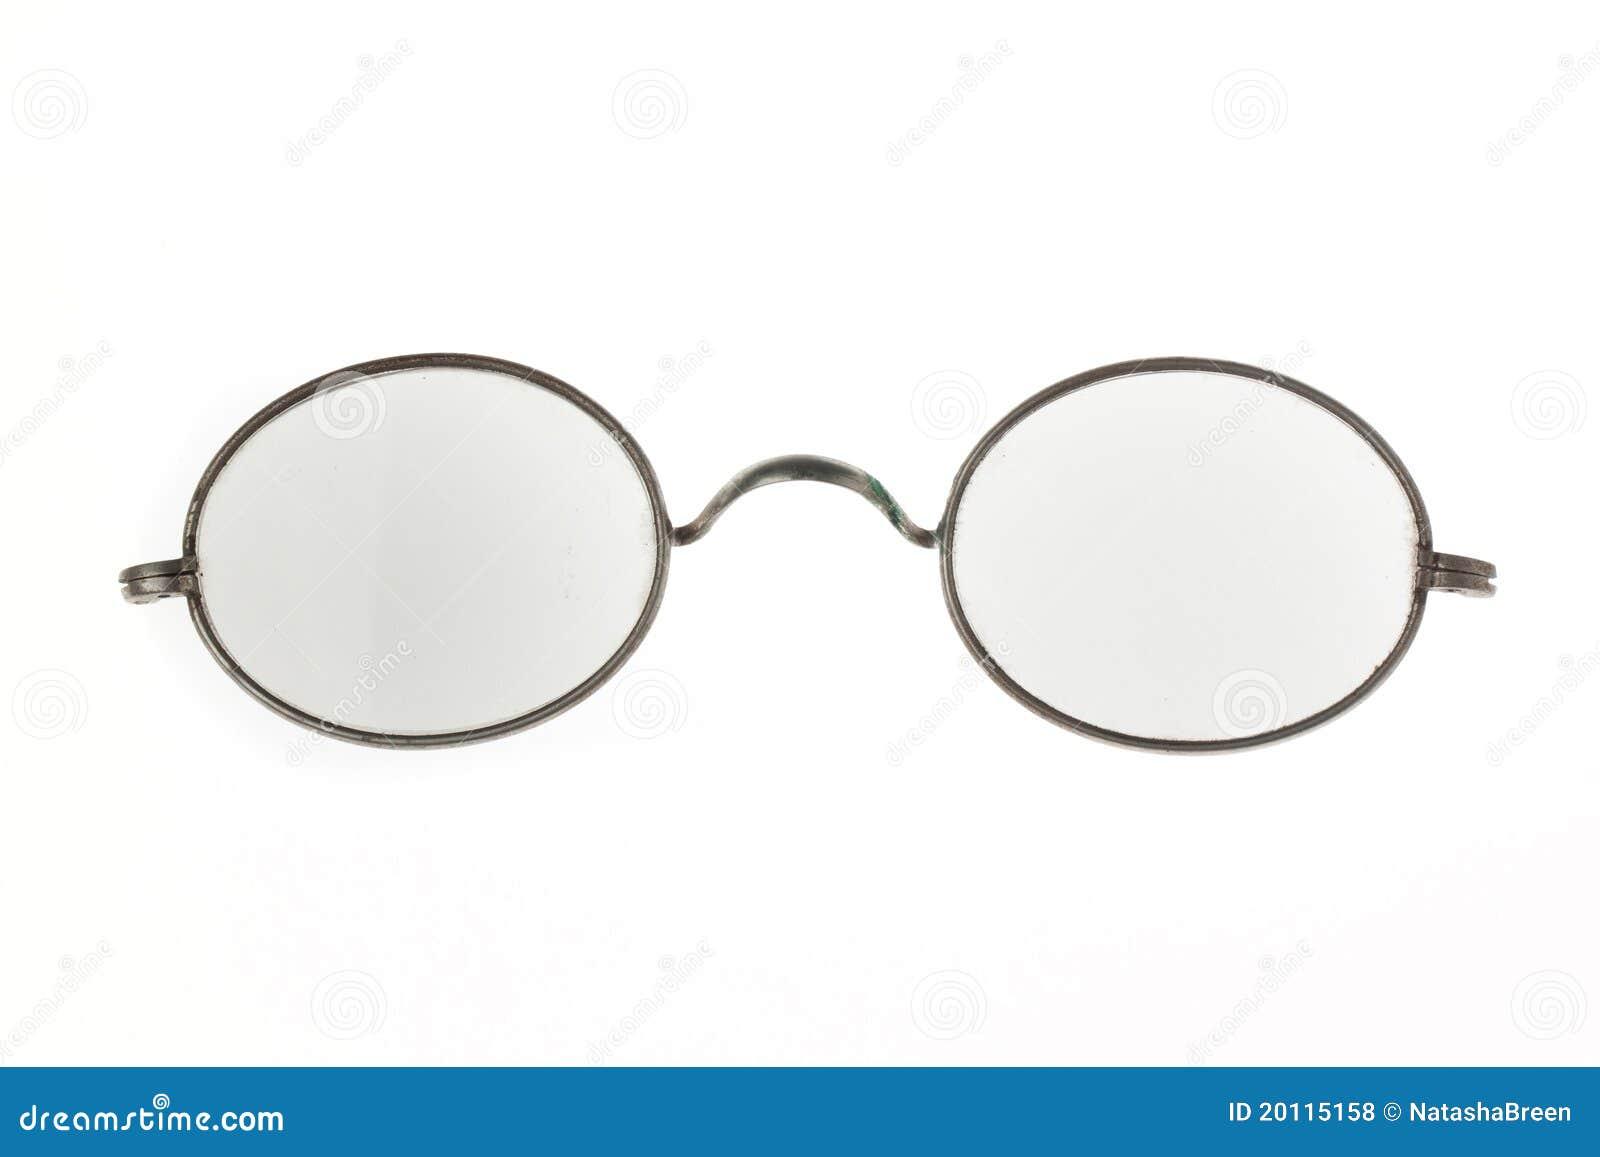 dating vintage eyeglasses